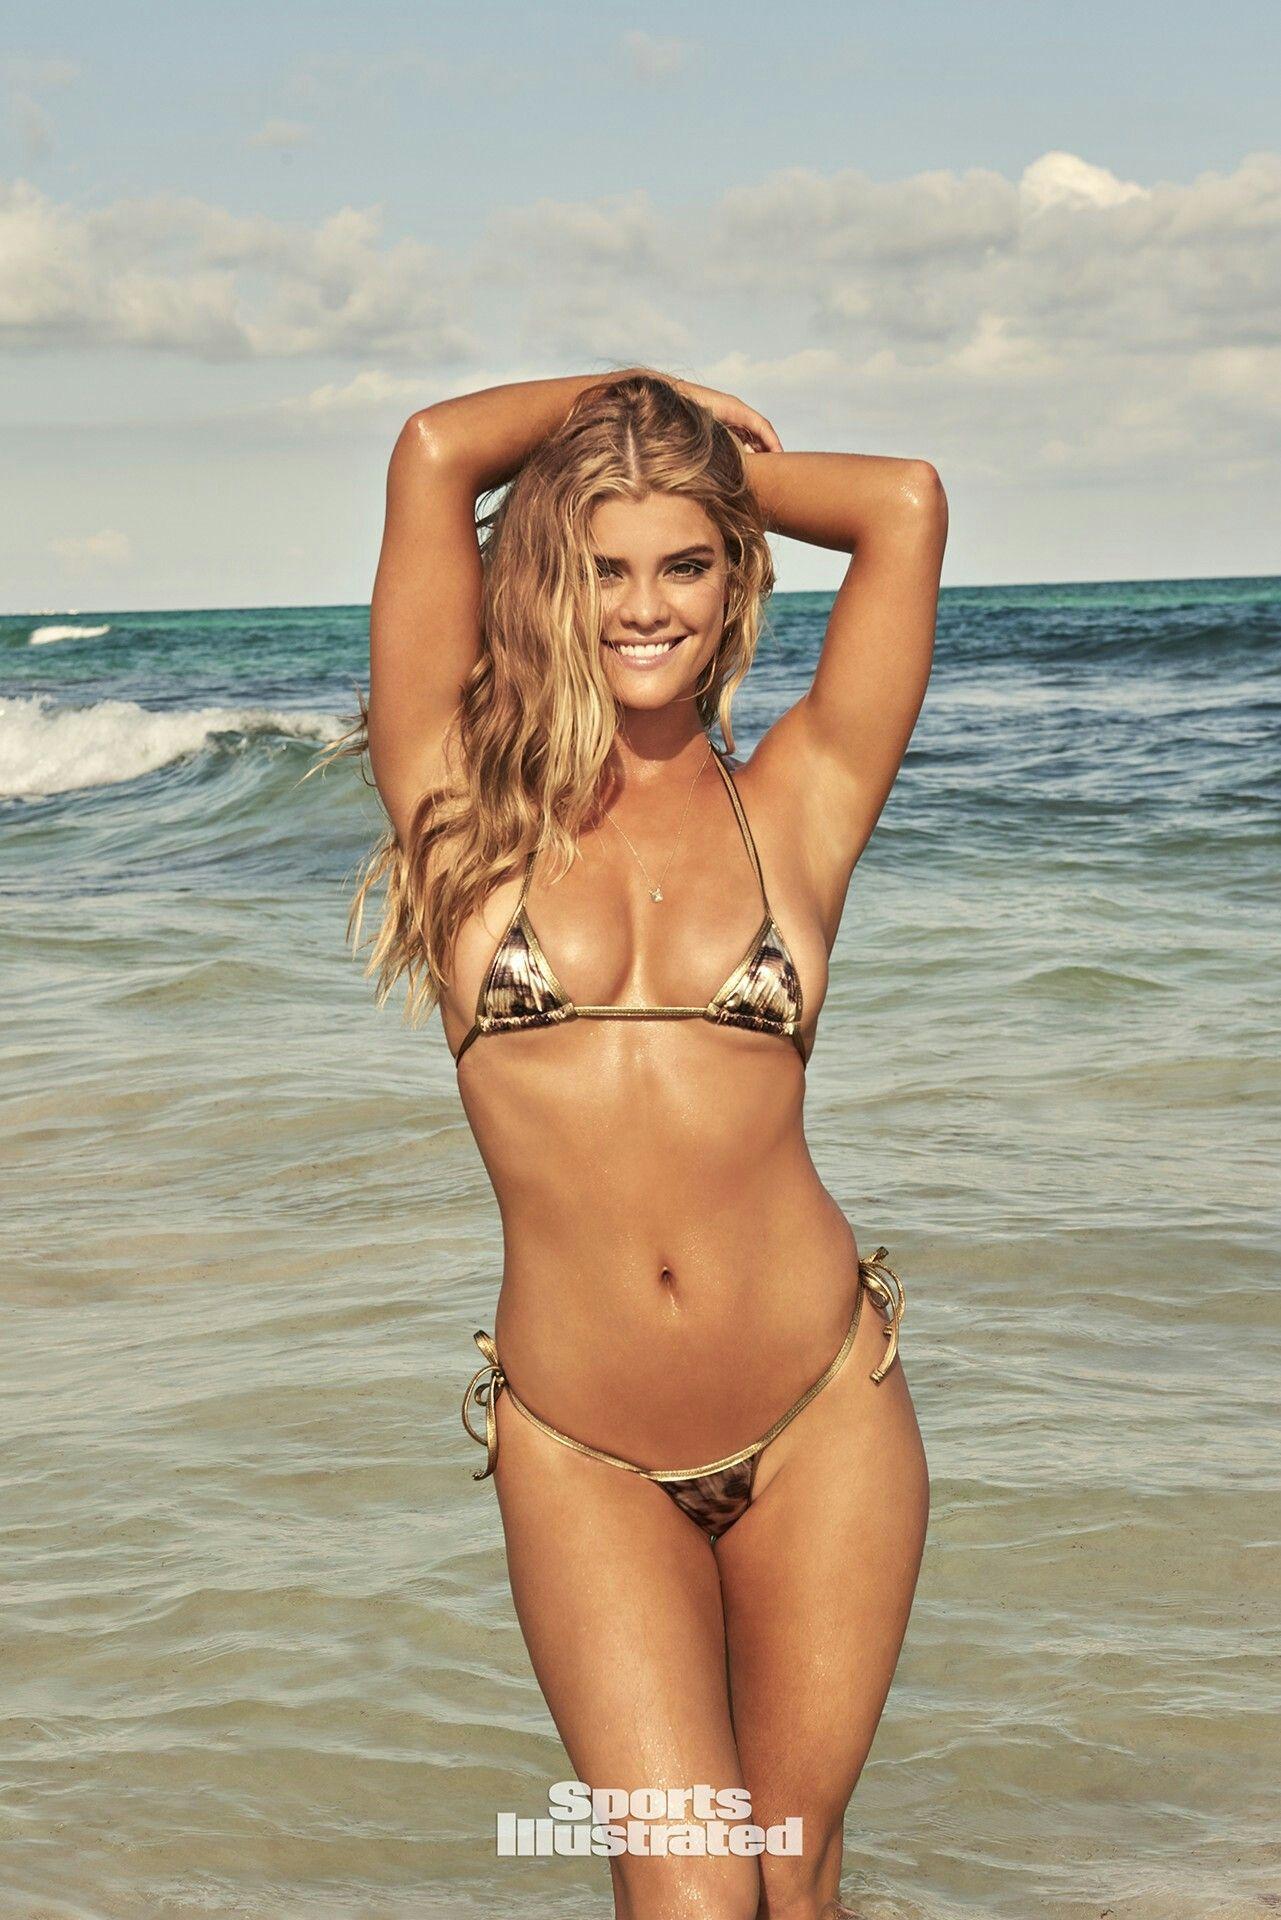 94f6dc9de9056 Nina Agdal - Sports Illustrated Swimsuit Issue 2017 | Nina Agdal ...